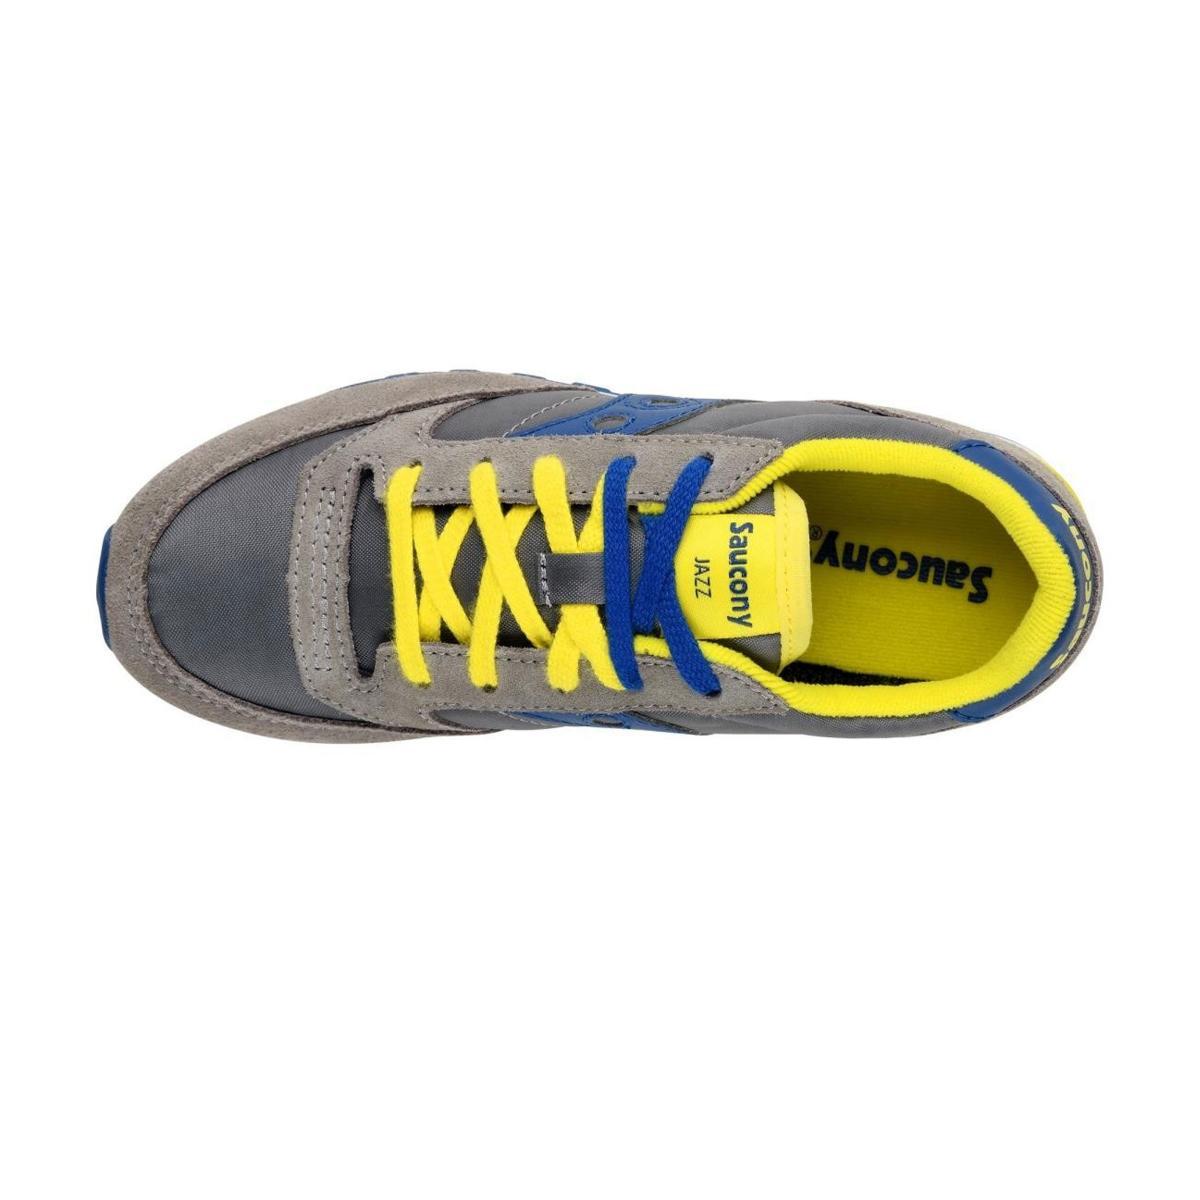 Scarpe Sneakers Saucony Jazz Original Grey/Blue Boys da bambino rif. SK261001